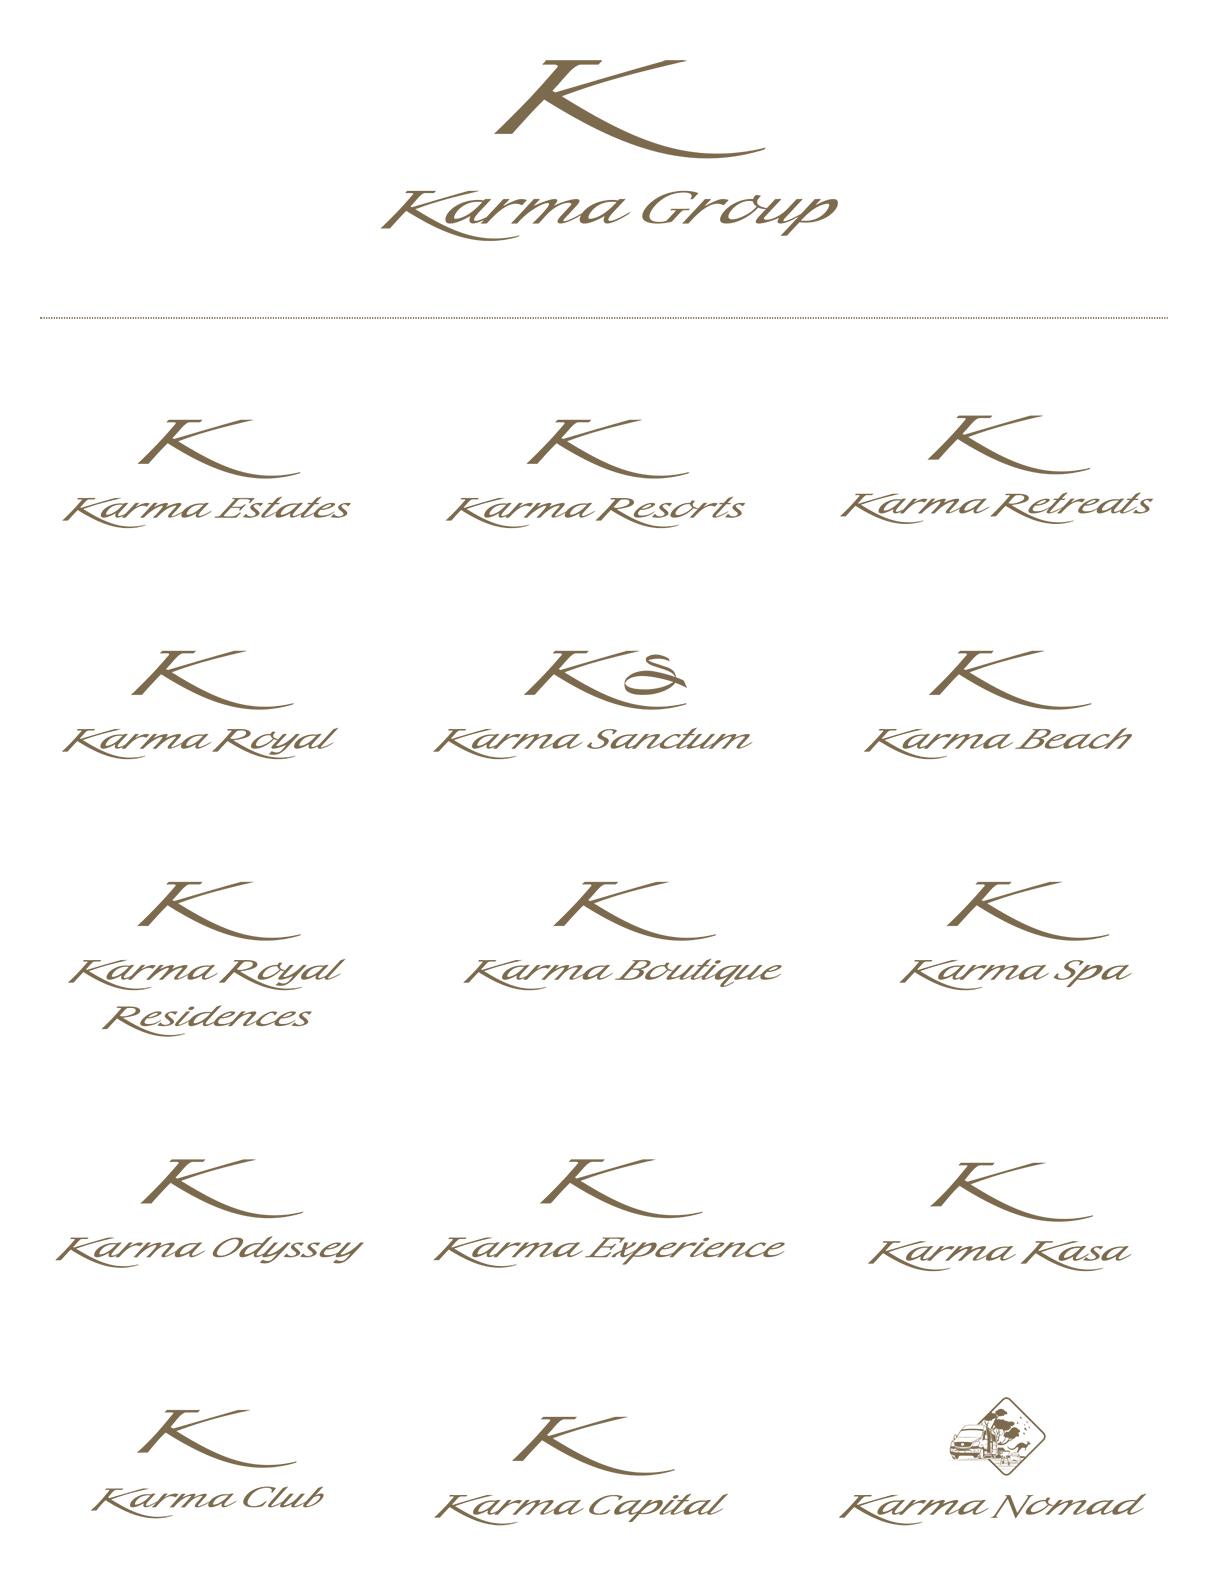 Karma Group Brands